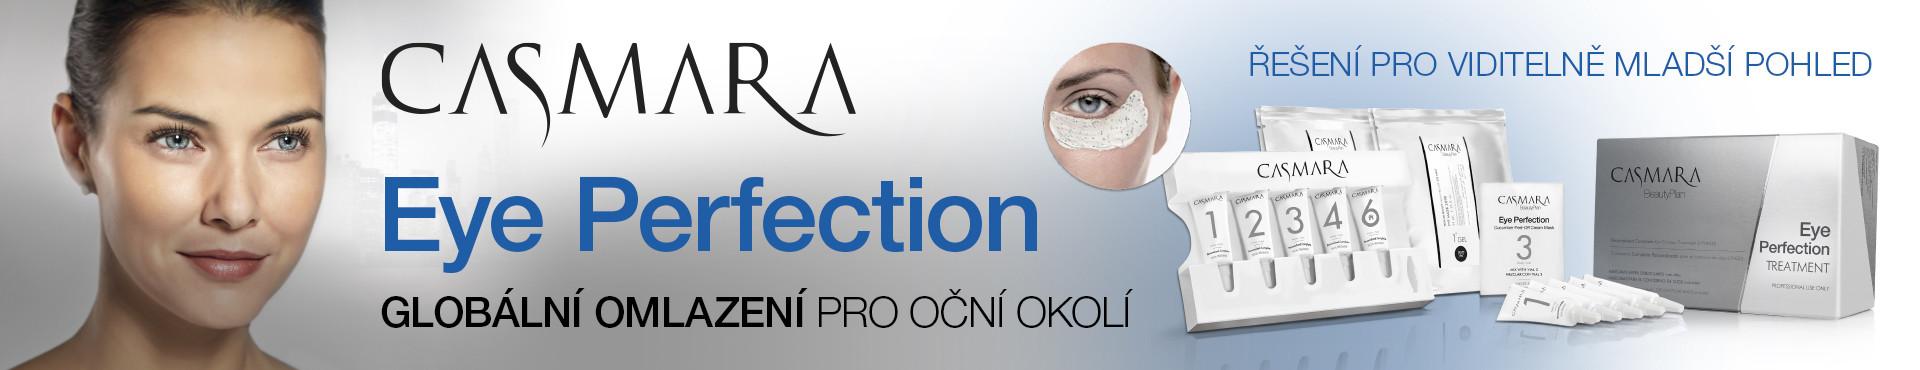 Casmara Eye Perfection